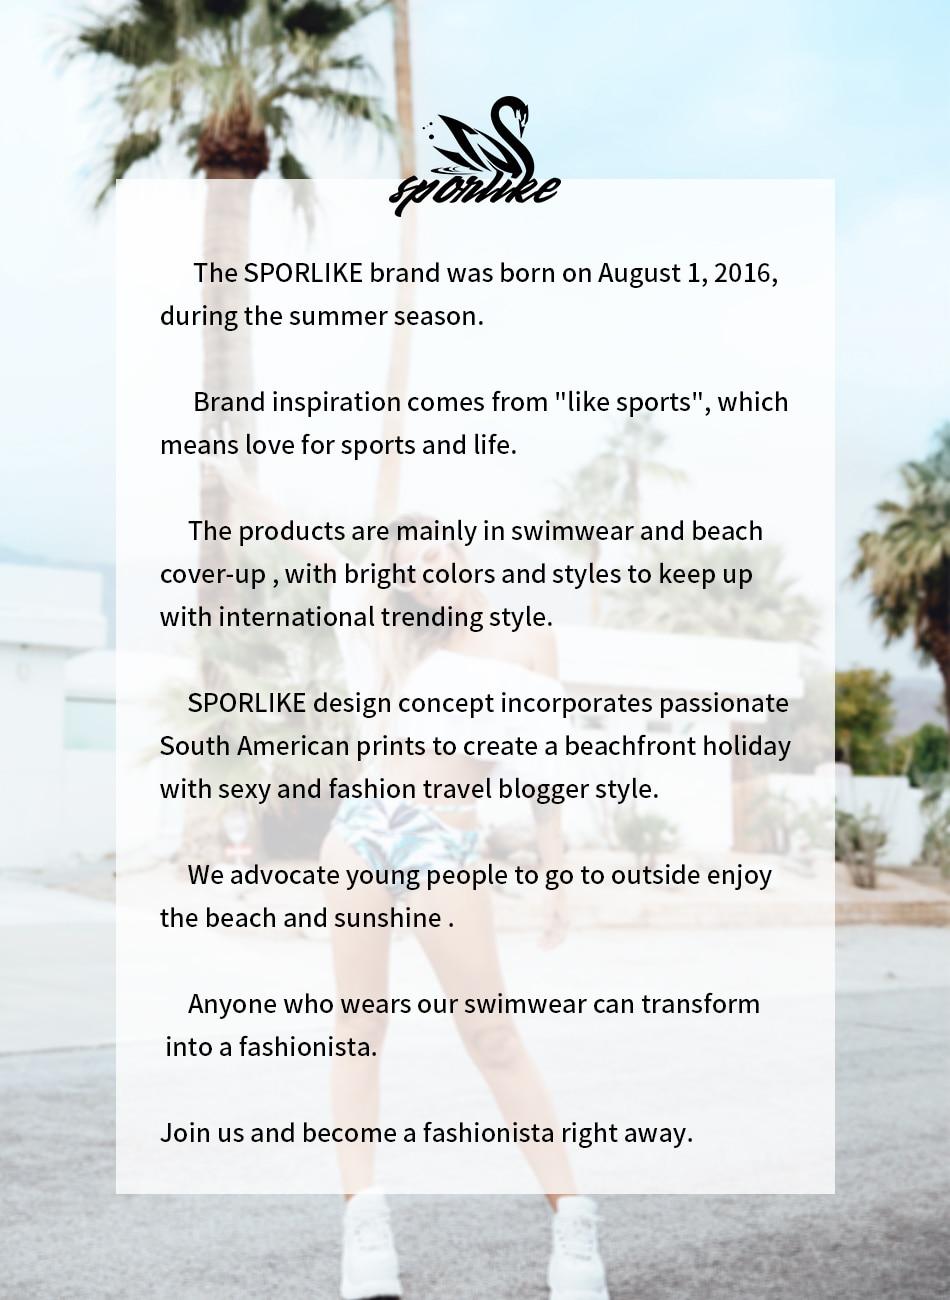 HTB1tOZDQjDpK1RjSZFrq6y78VXaw Floral Ruffled Hem Bikini Set Women Flora V-neck High-waisted Two Piece Swimsuit 2018 Girl Beach Bathing Suit Swimwear Biquinis